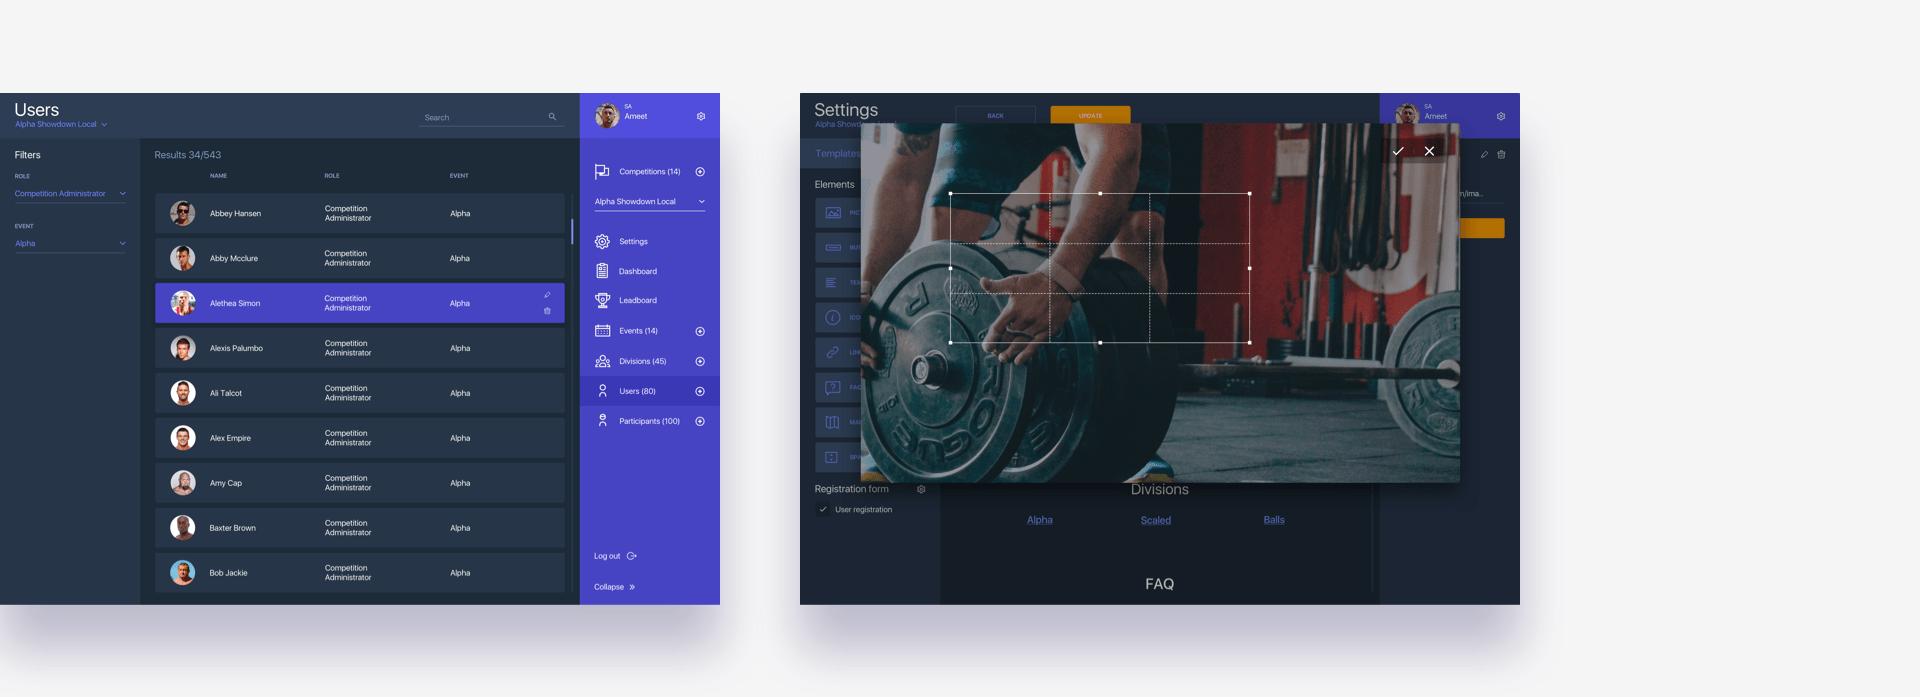 crossfit_desktop_3